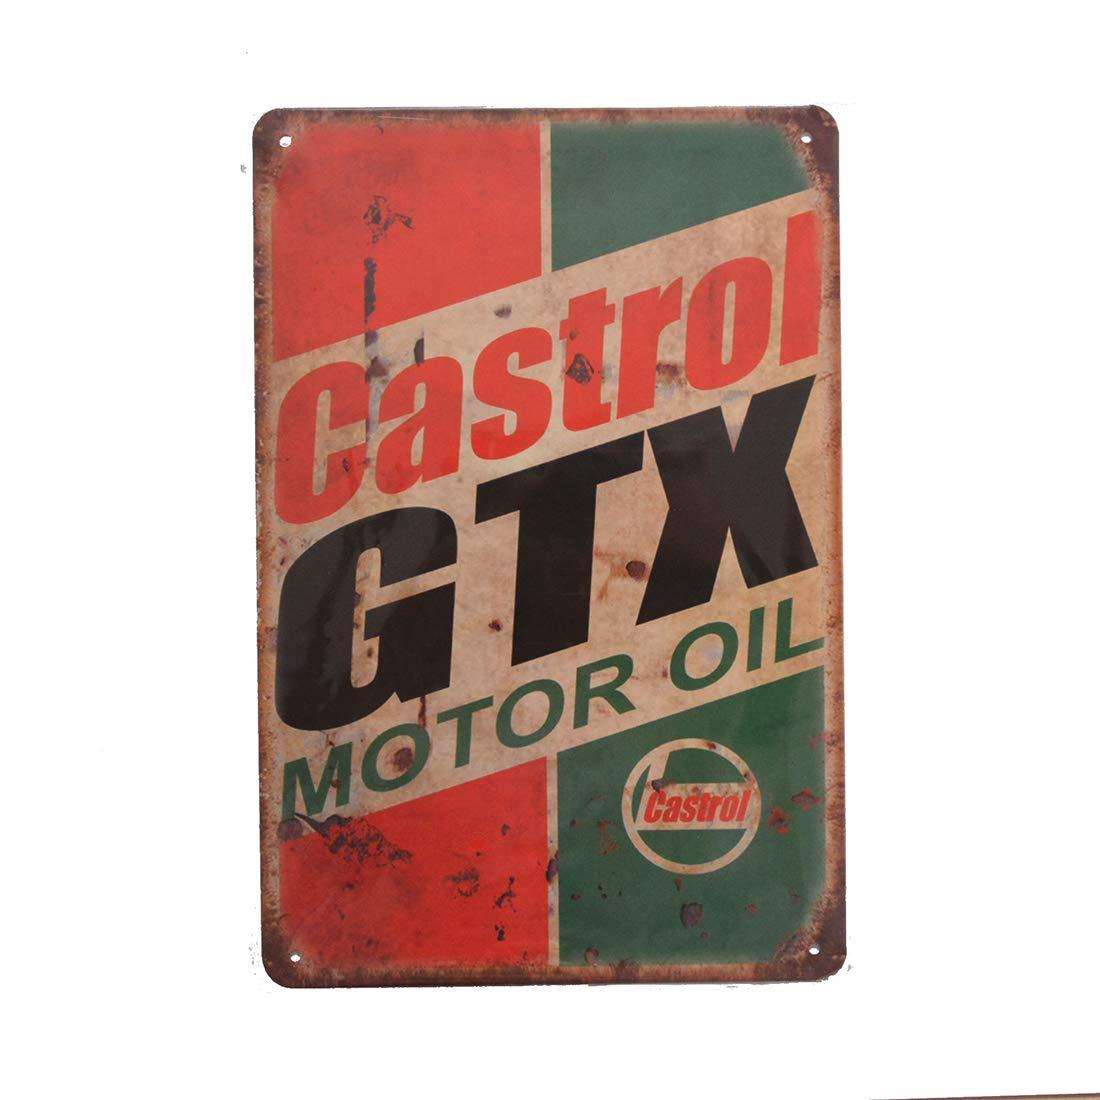 Wall Decor for Home Garage Bar Man Cave 8x12//20x30cm PEIs Retro Vintage Tin Metal Sign Castrol Motor Oil